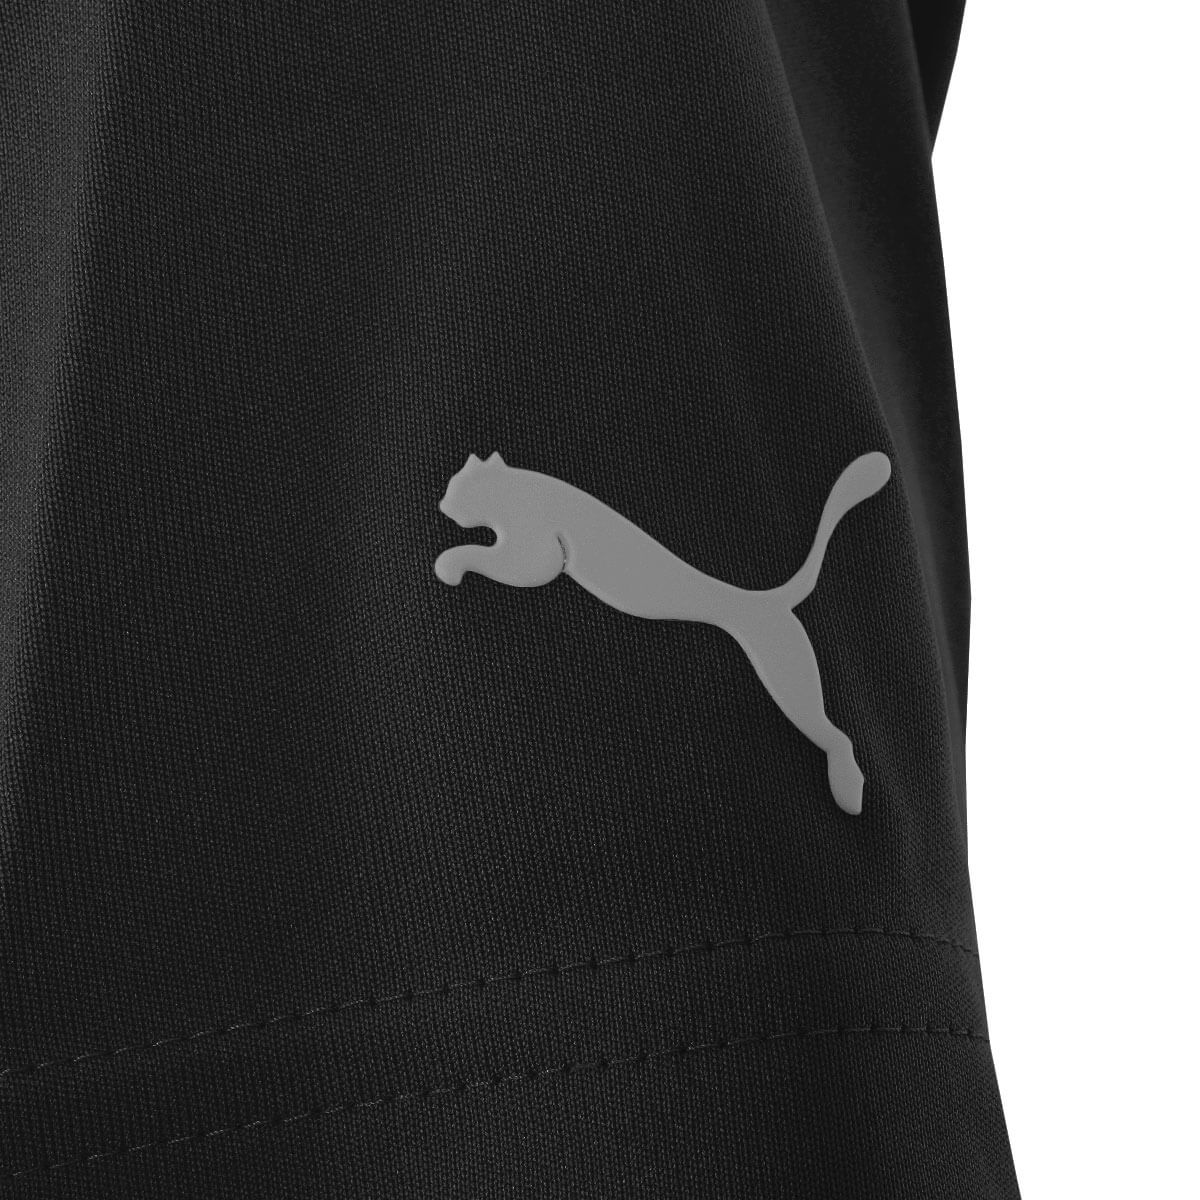 Puma-Golf-Mens-Essential-Pounce-Cresting-DryCell-Tech-Polo-Shirt-46-OFF-RRP thumbnail 4